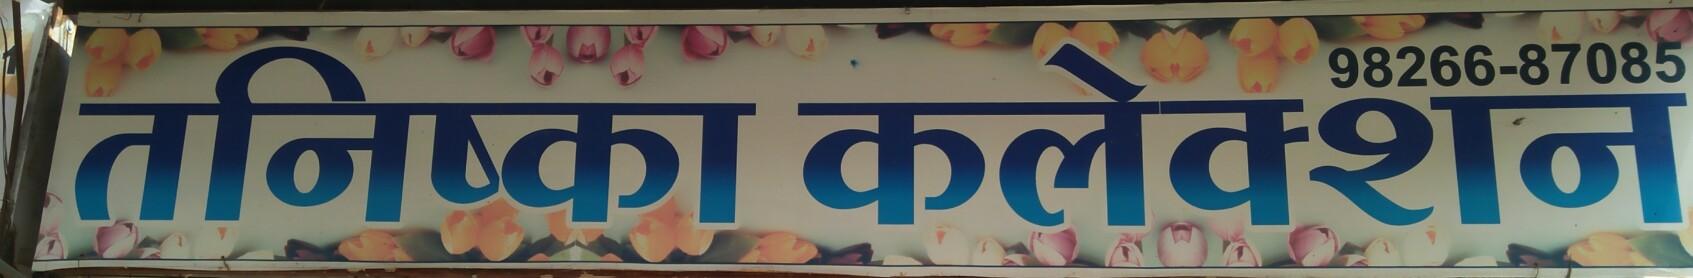 Tanishka collection